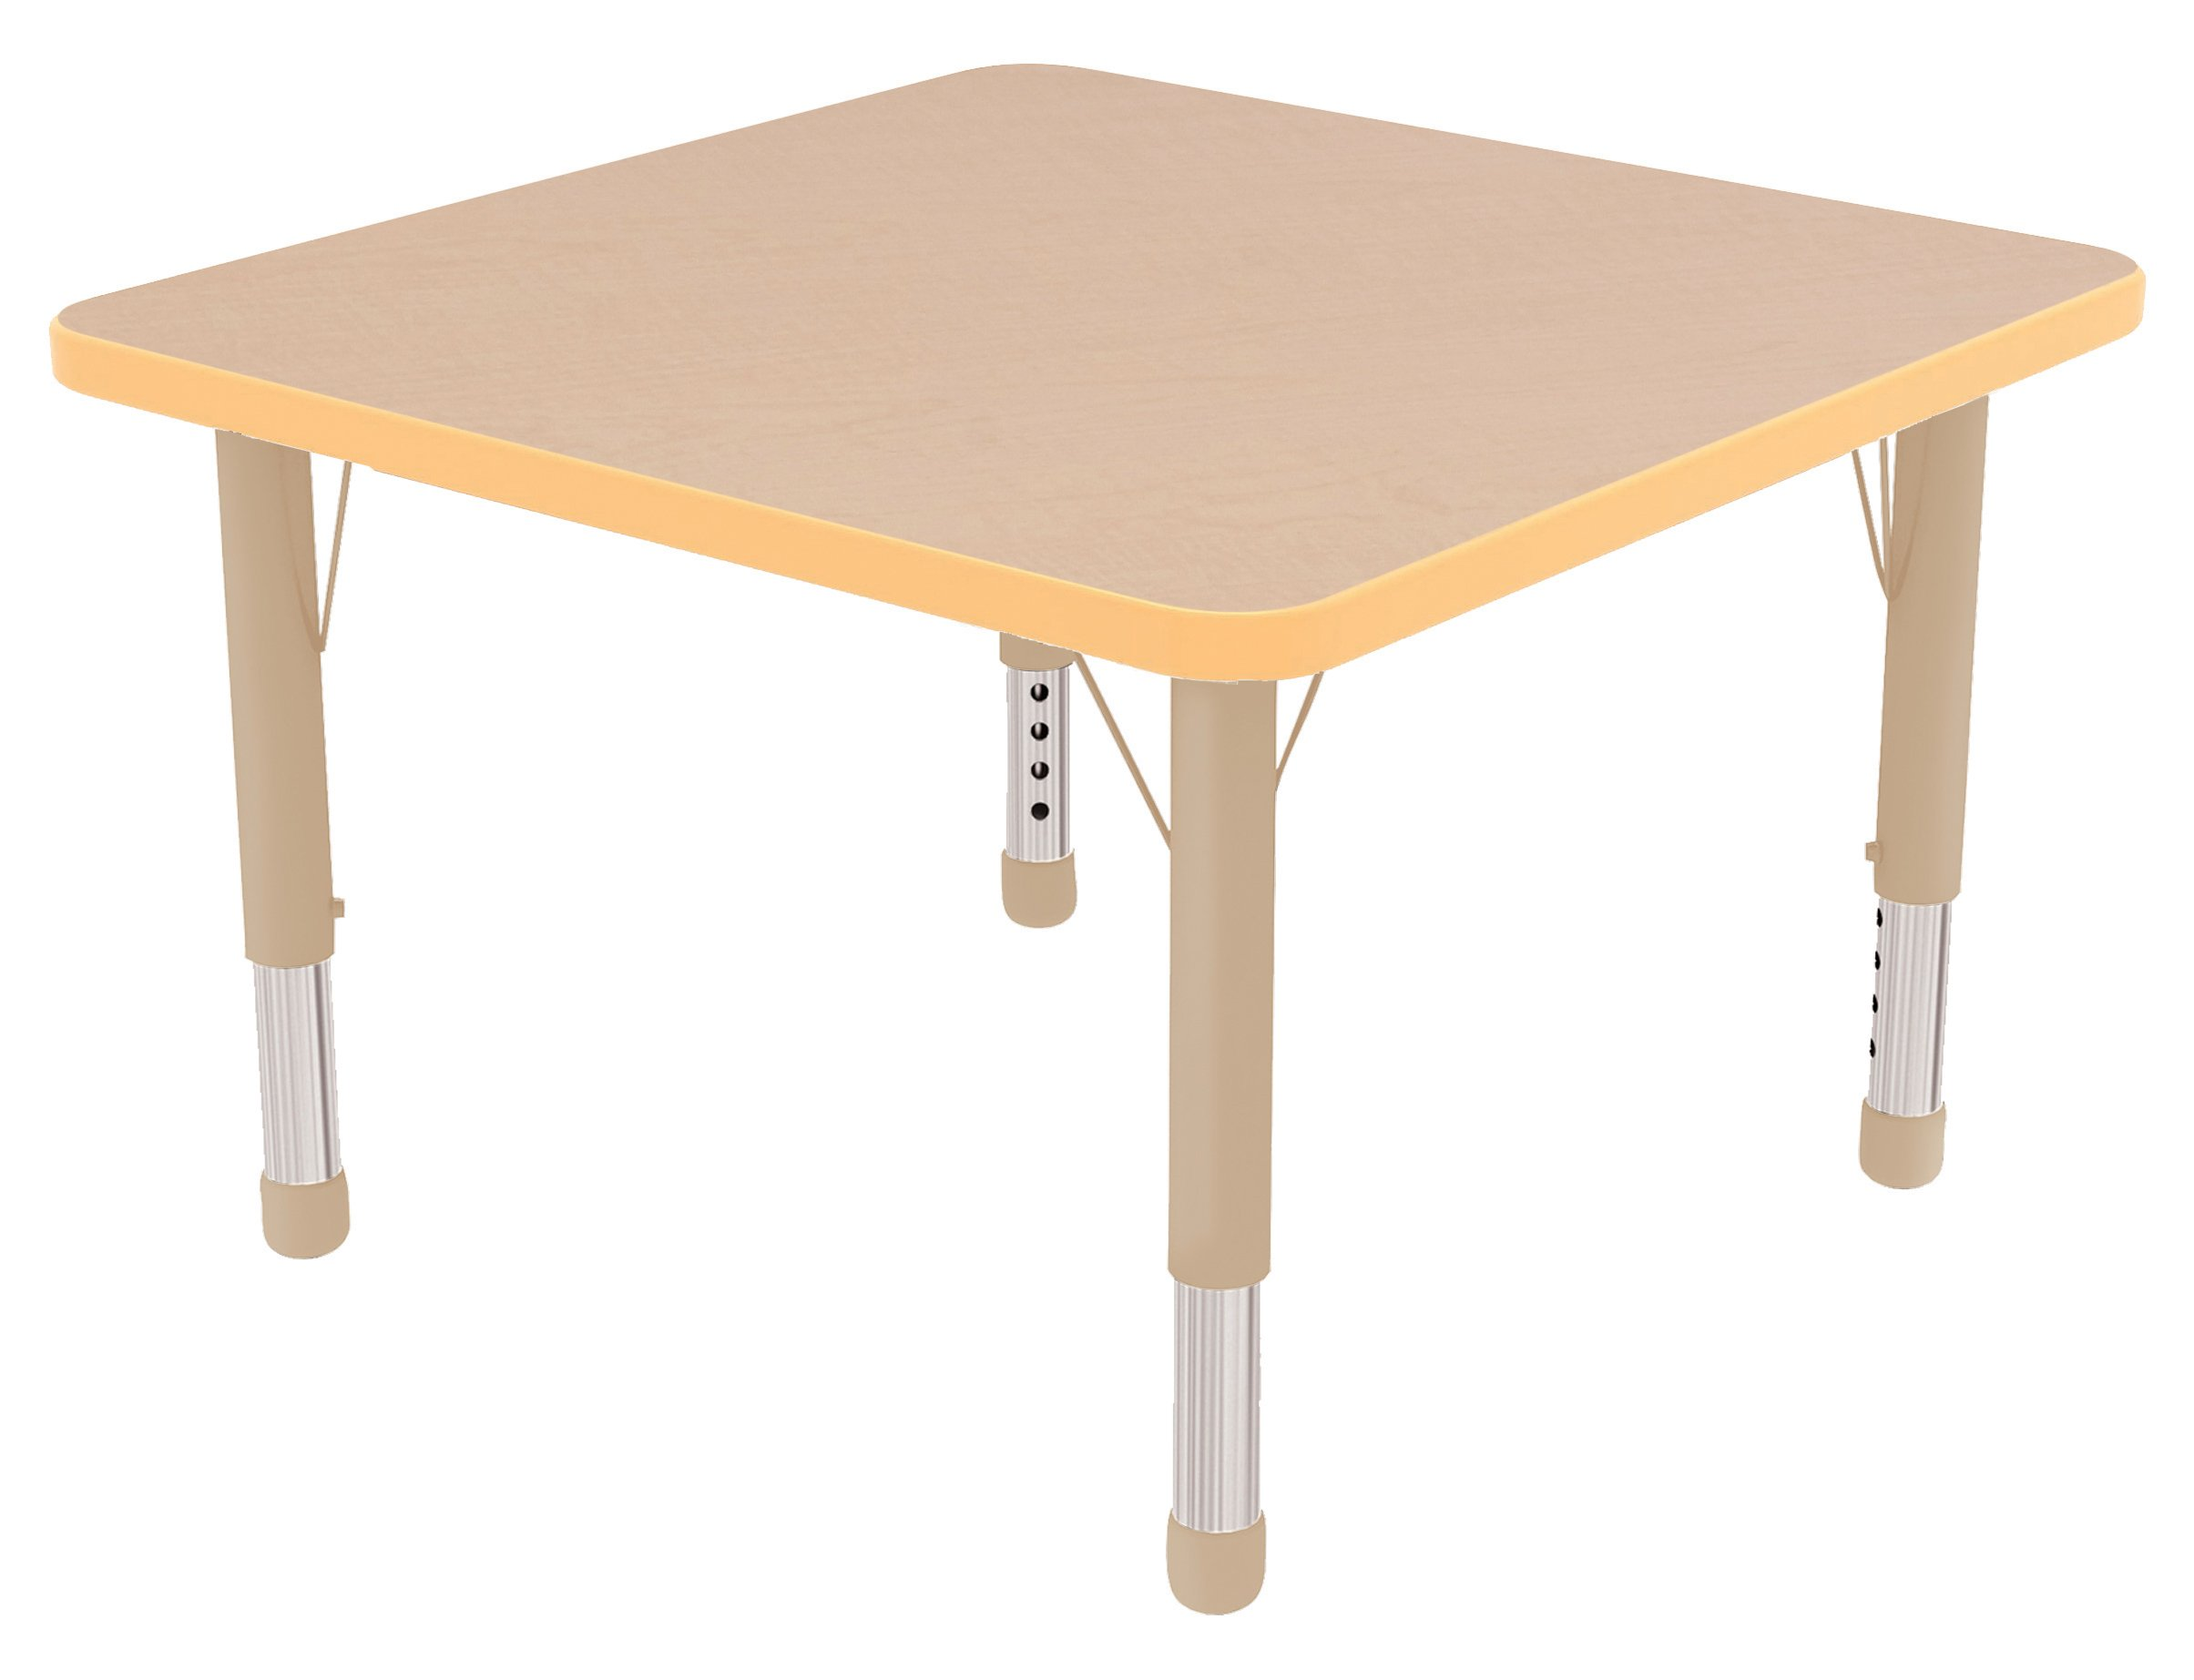 ECR4Kids 30'' Square Activity School Table, Chunky Legs, Adjustable Height 15-24 inch (Oak/Black)